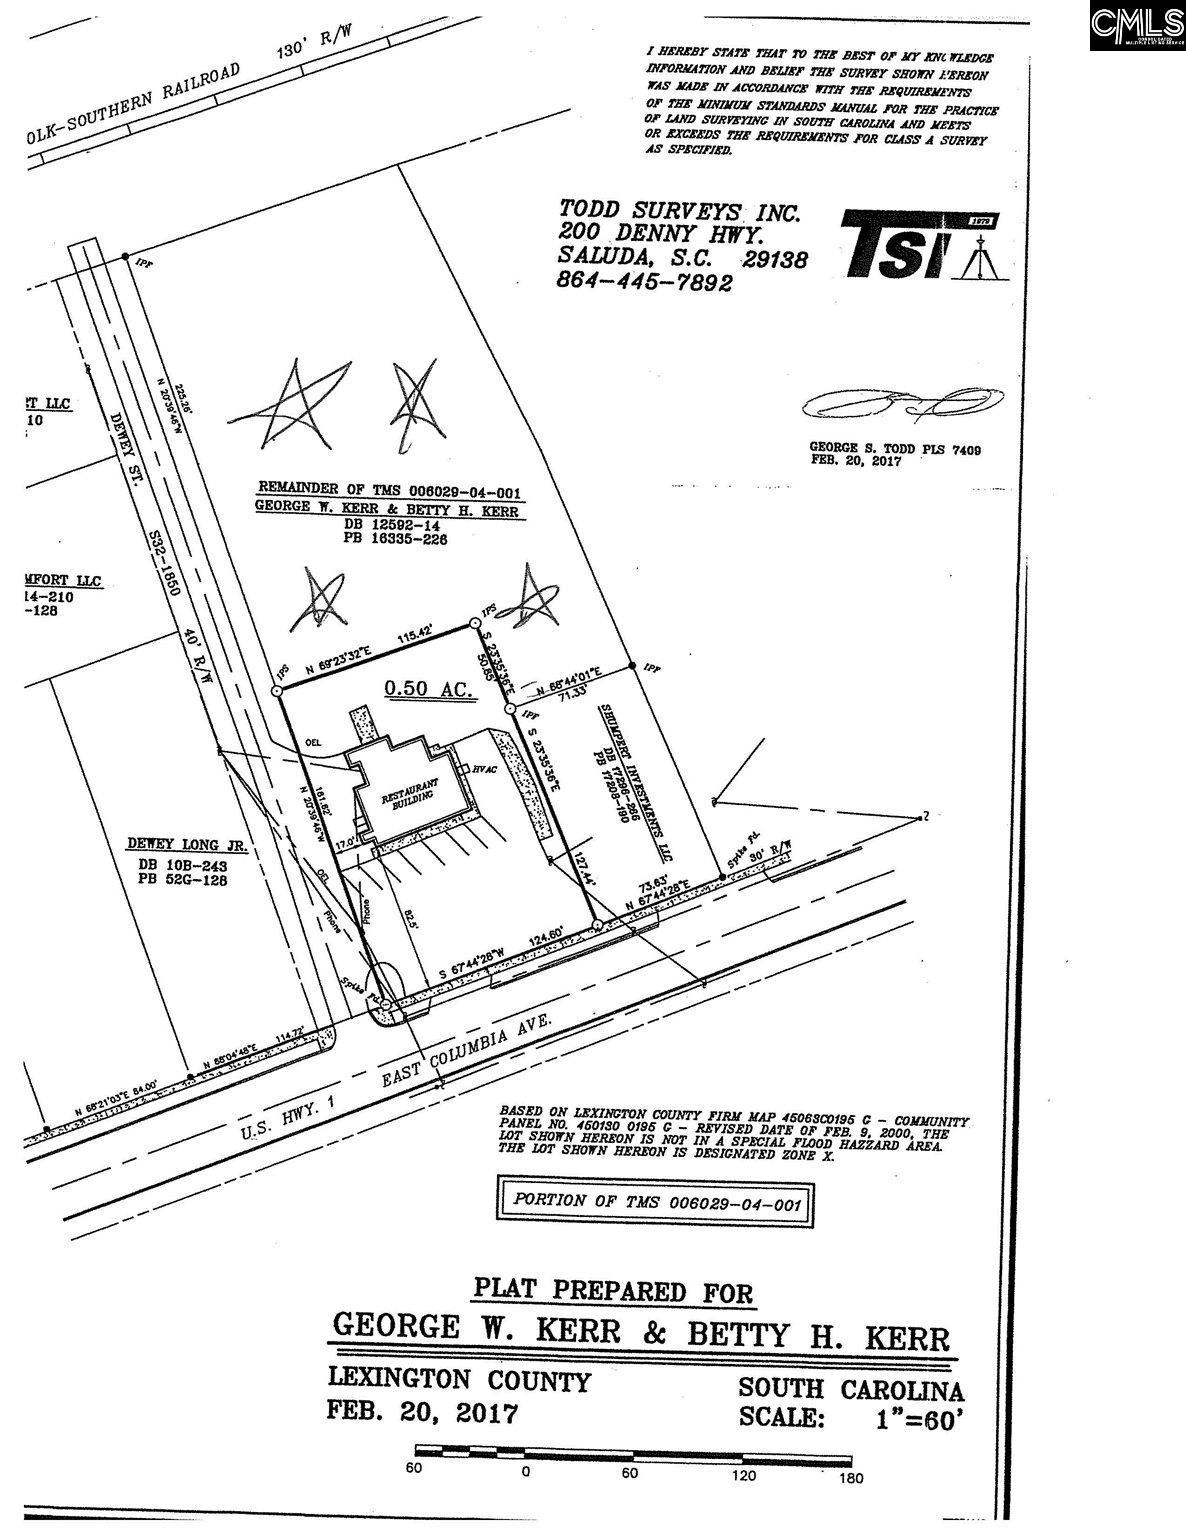 Dewey (s32-1850) #lot A Leesville, SC 29070